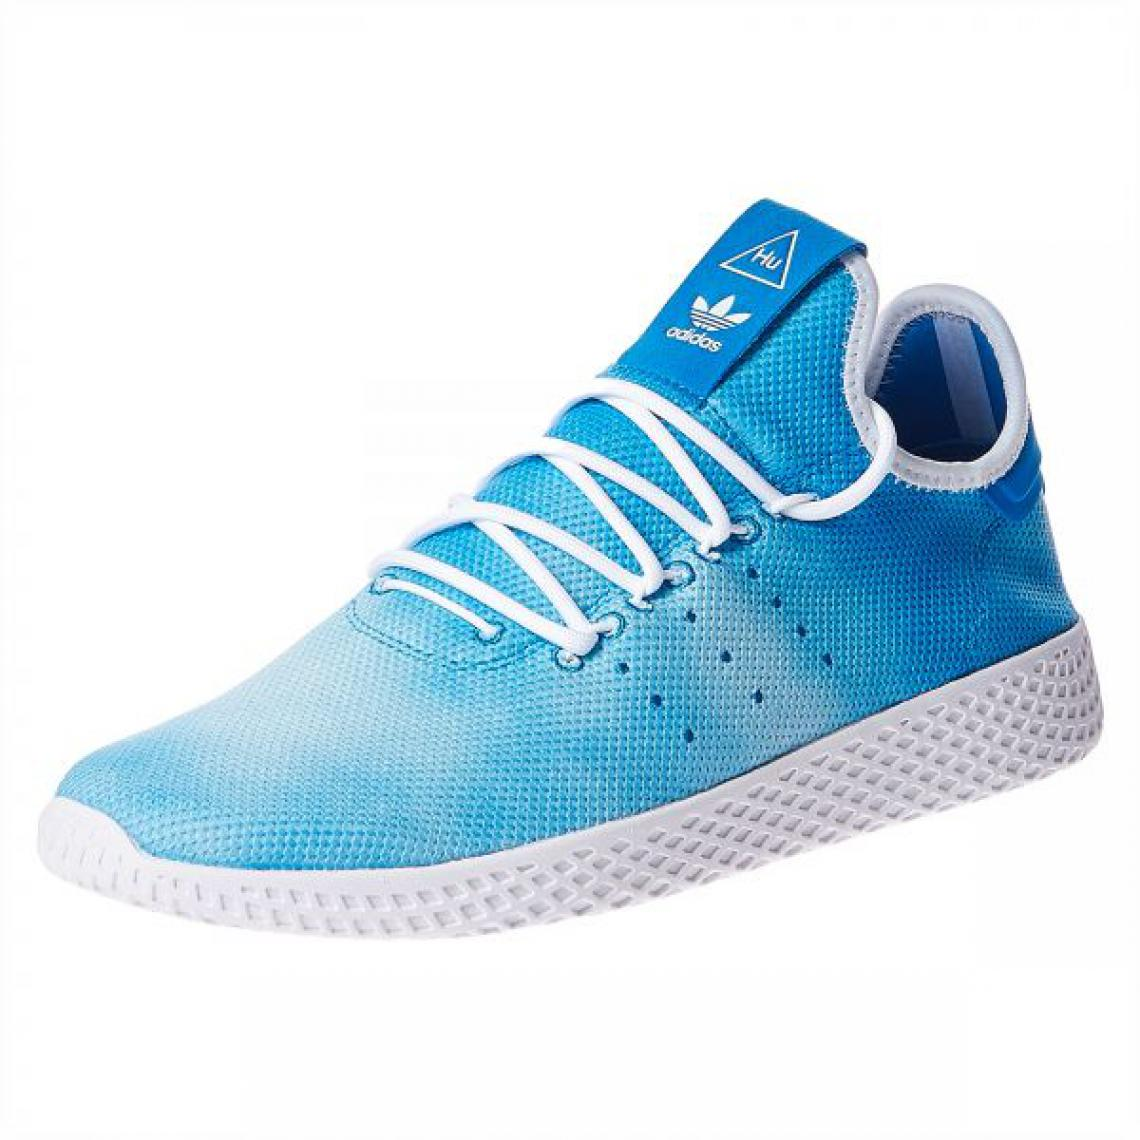 HOLI BLEU Adidas Originals - Sneakers homme